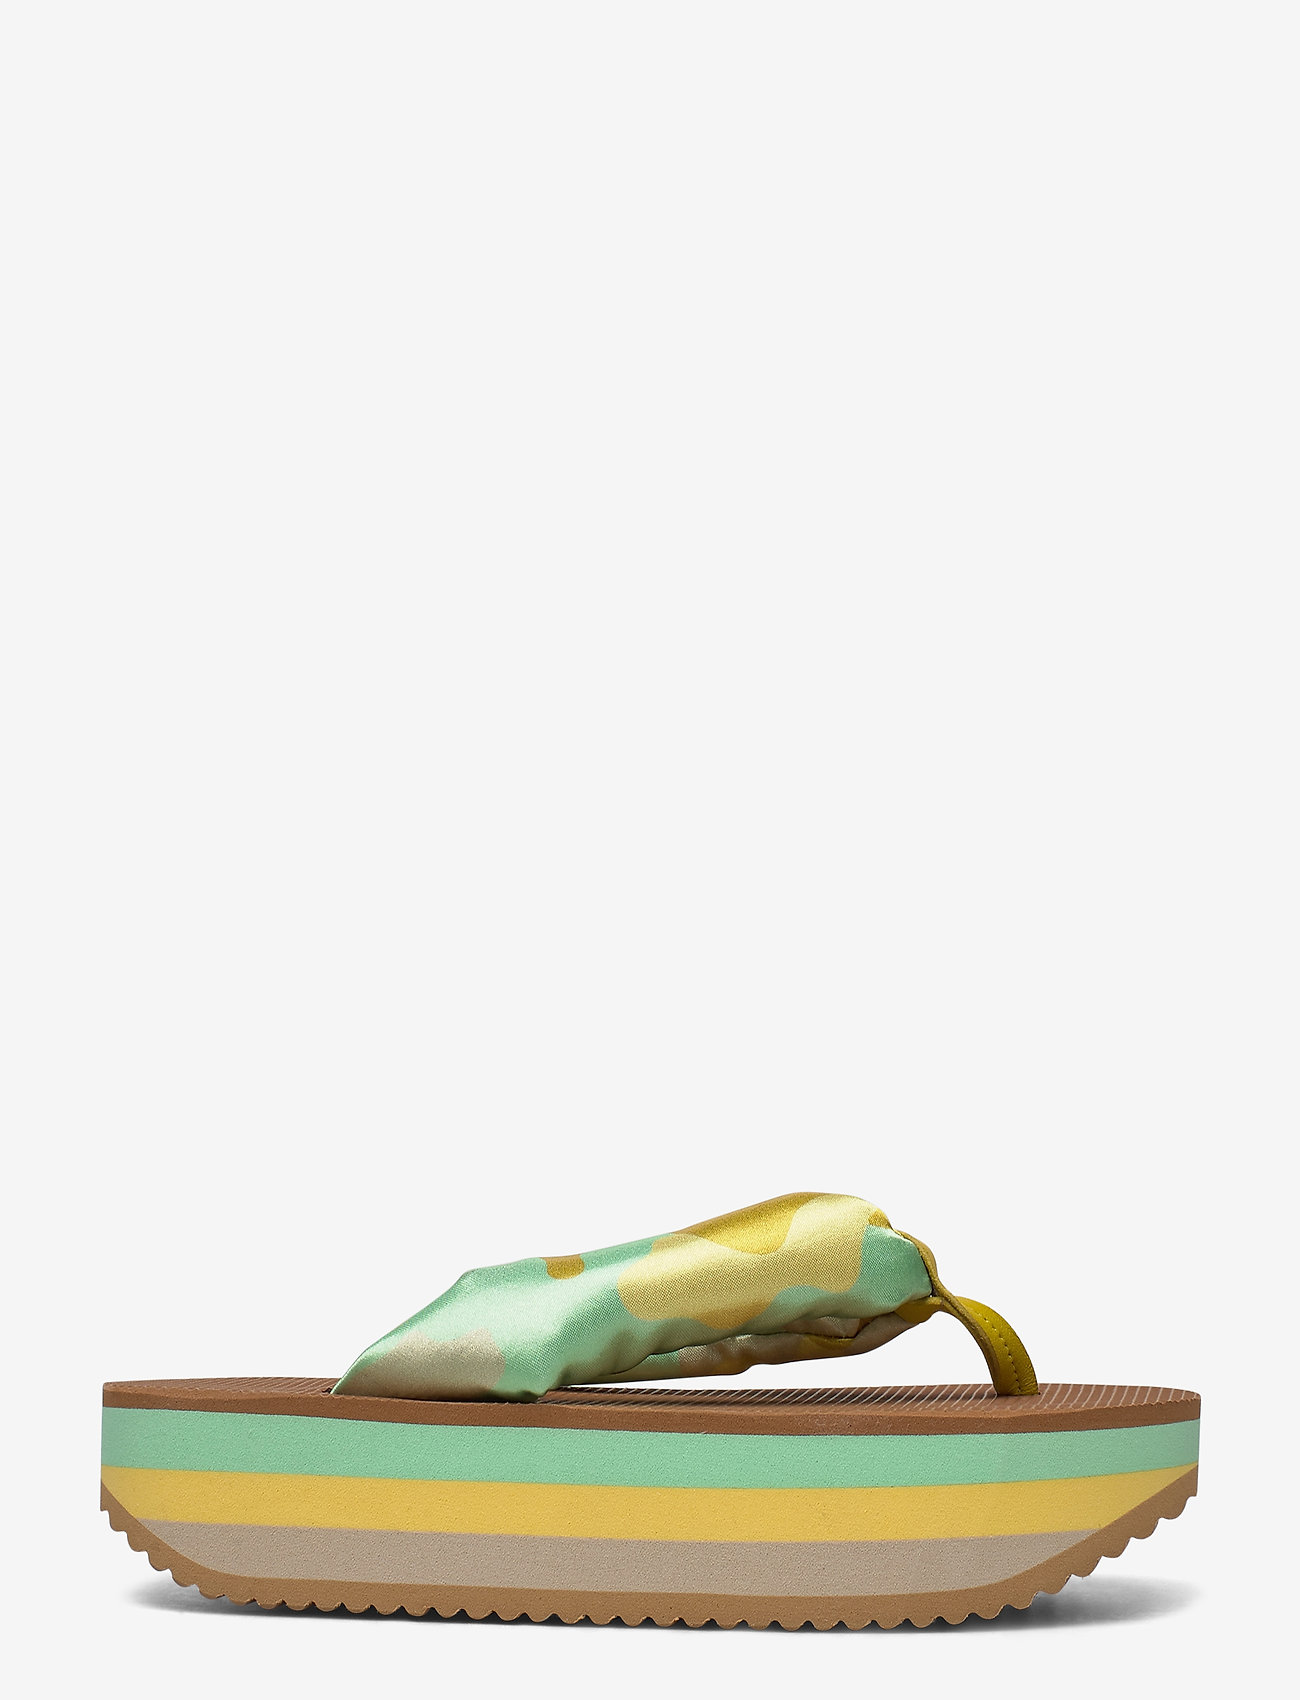 Trine, 889 Trine Sandals (Camouflage Green) - STINE GOYA dNgTTg